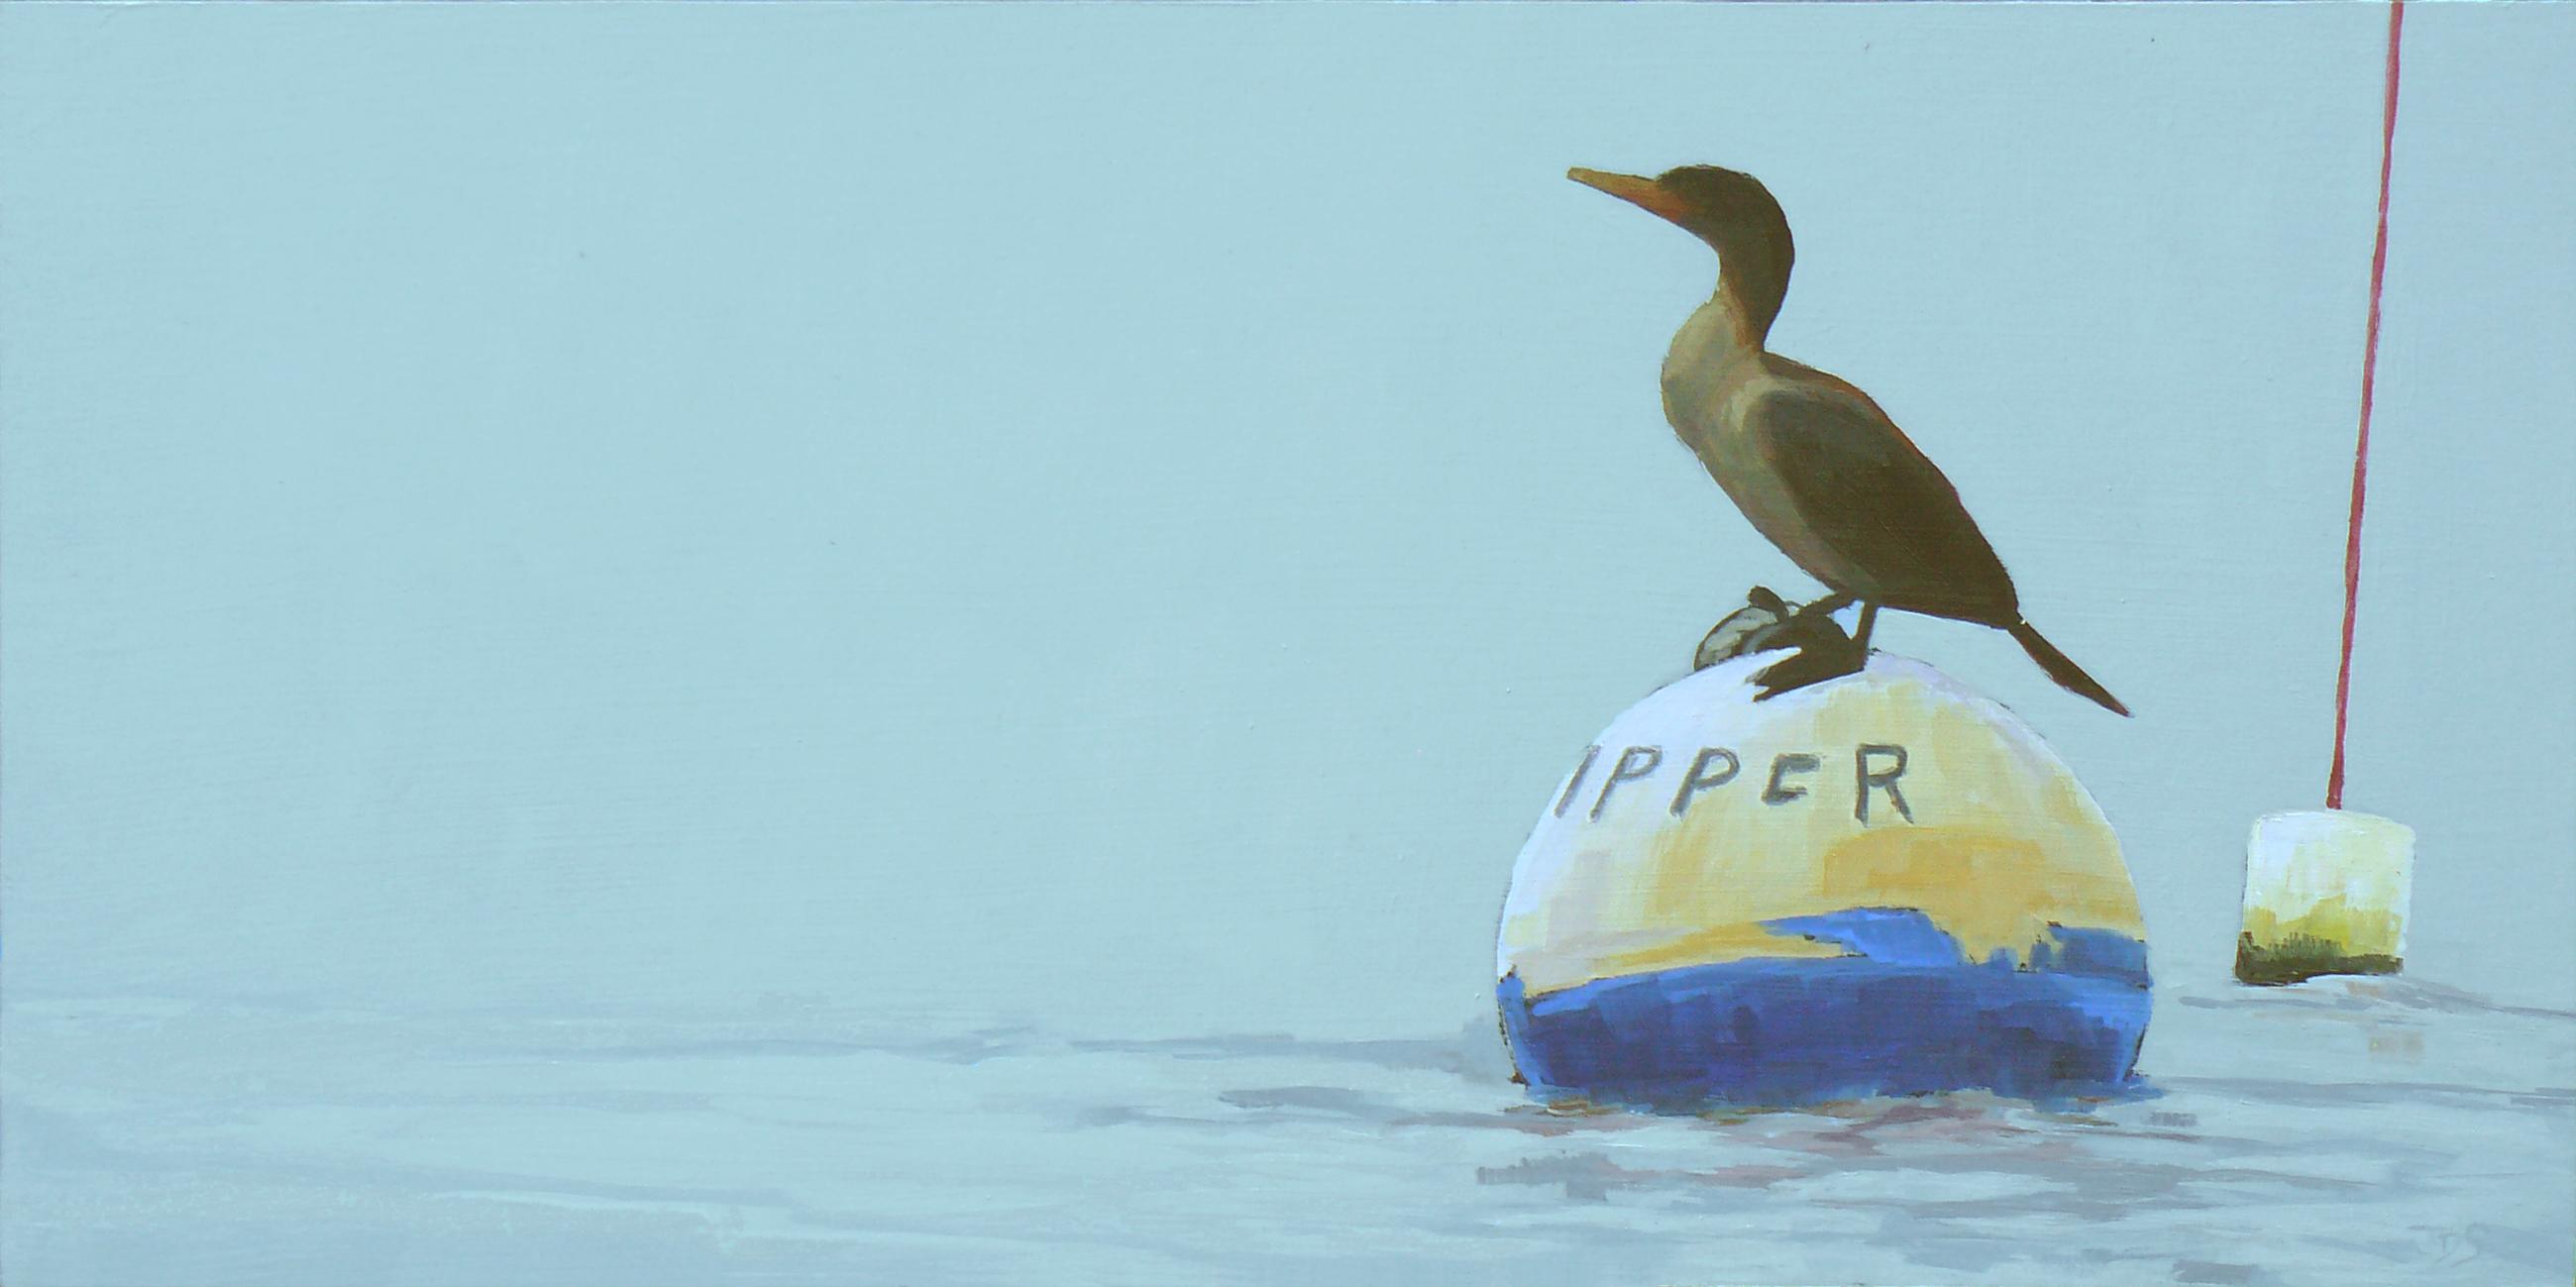 Skipper #1